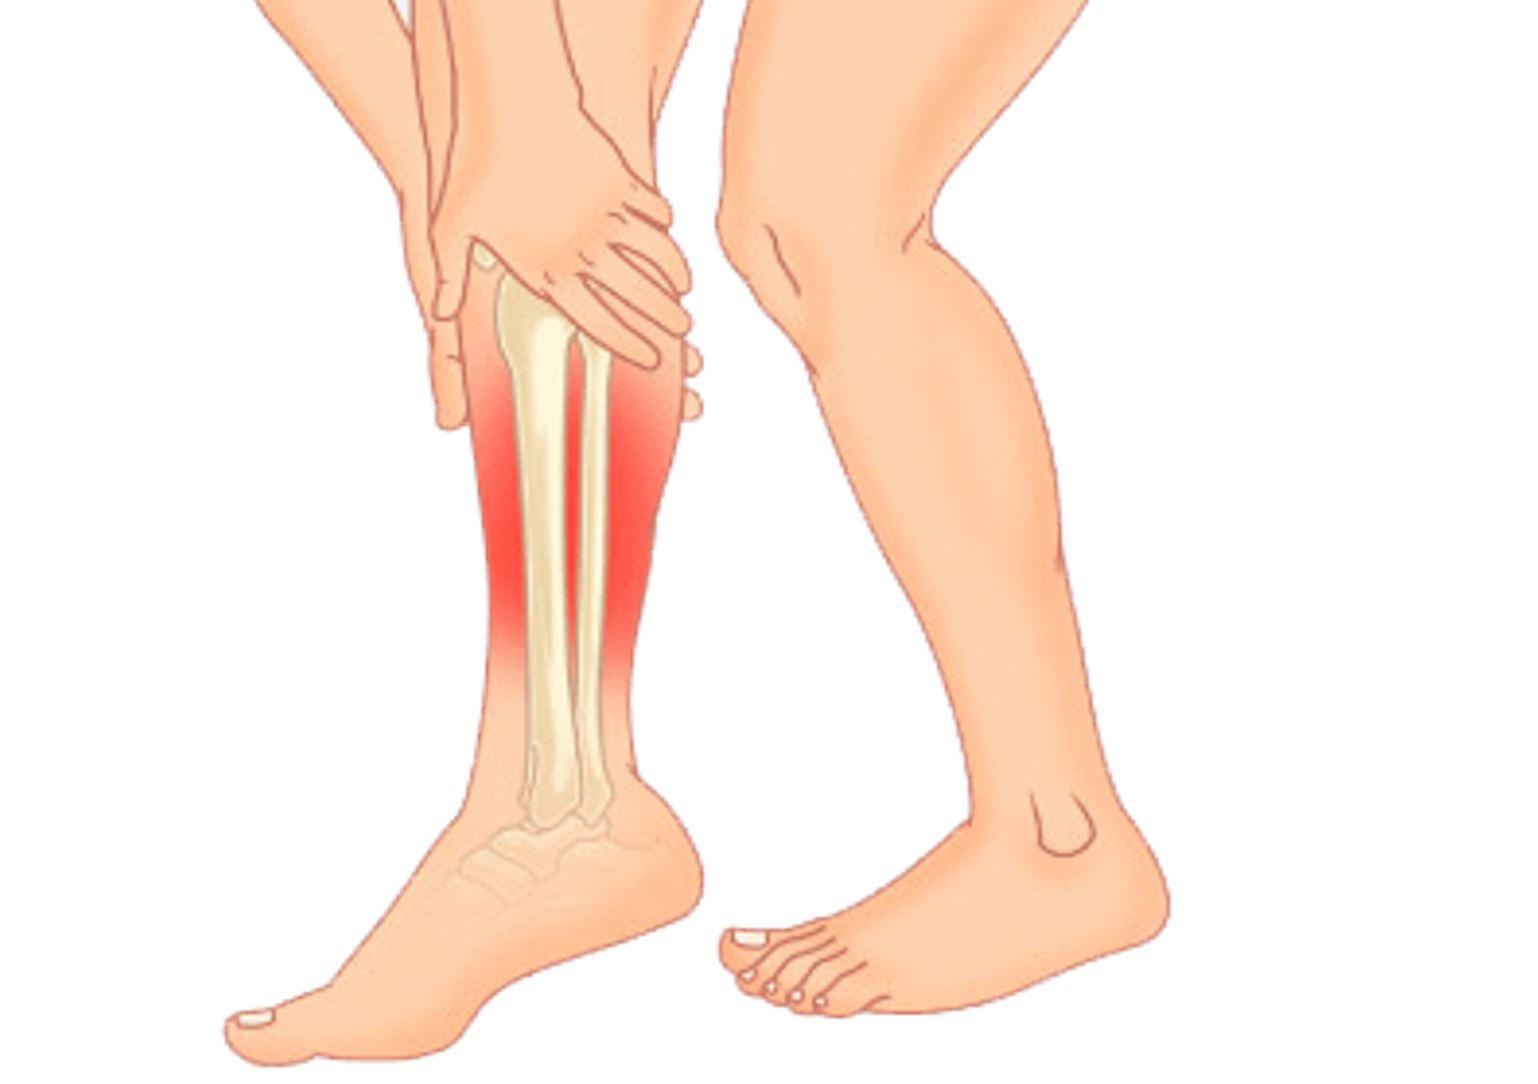 diagram showing where shin splints can cause pain